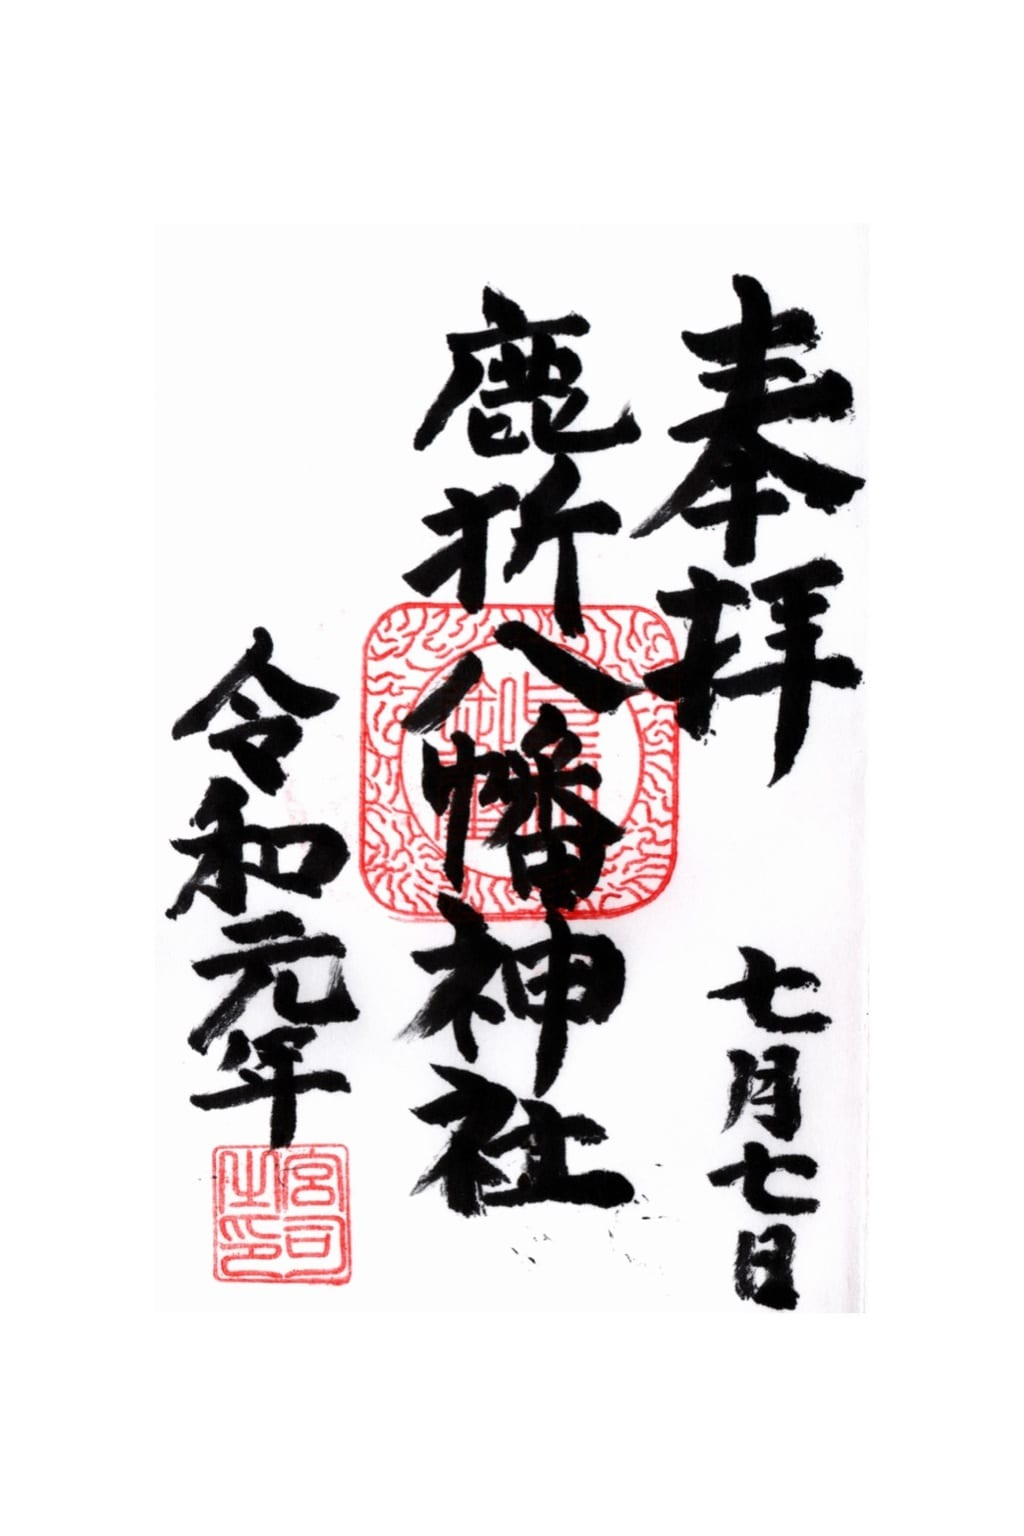 八幡神社(鹿折)の御朱印